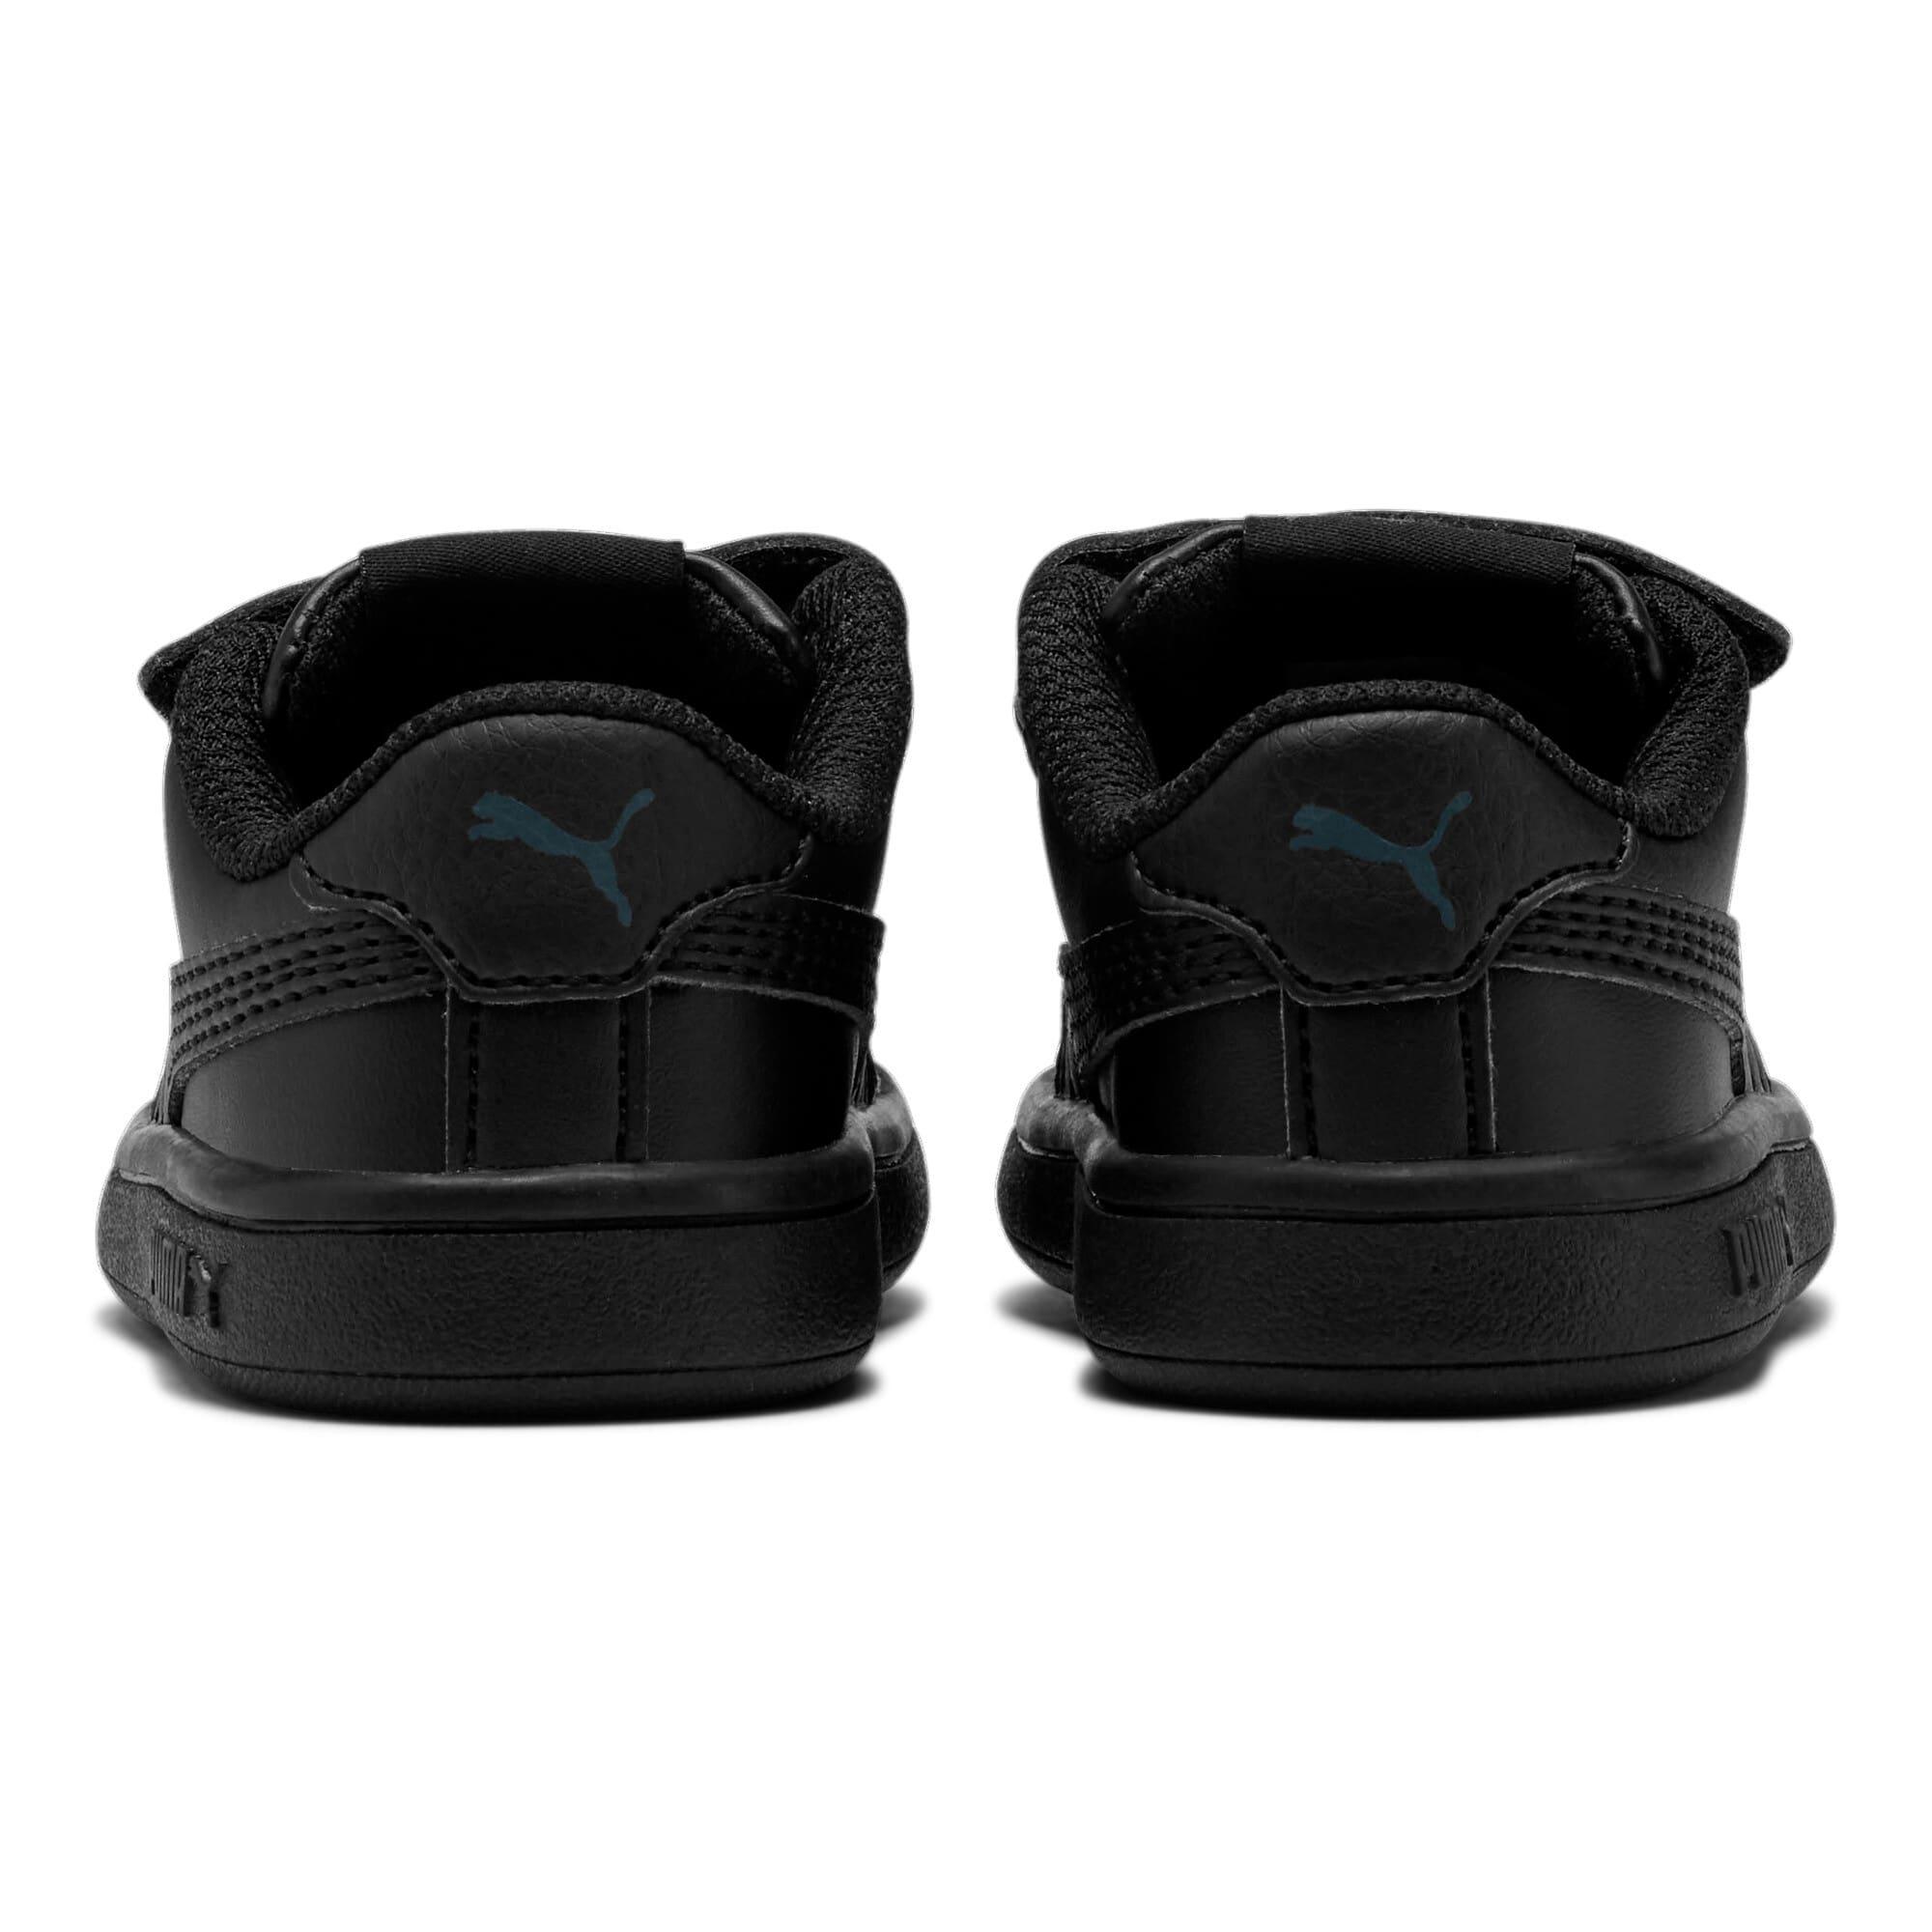 Thumbnail 3 of Puma Smash v2 L V Toddler Shoes, Puma Black-Puma Black, medium